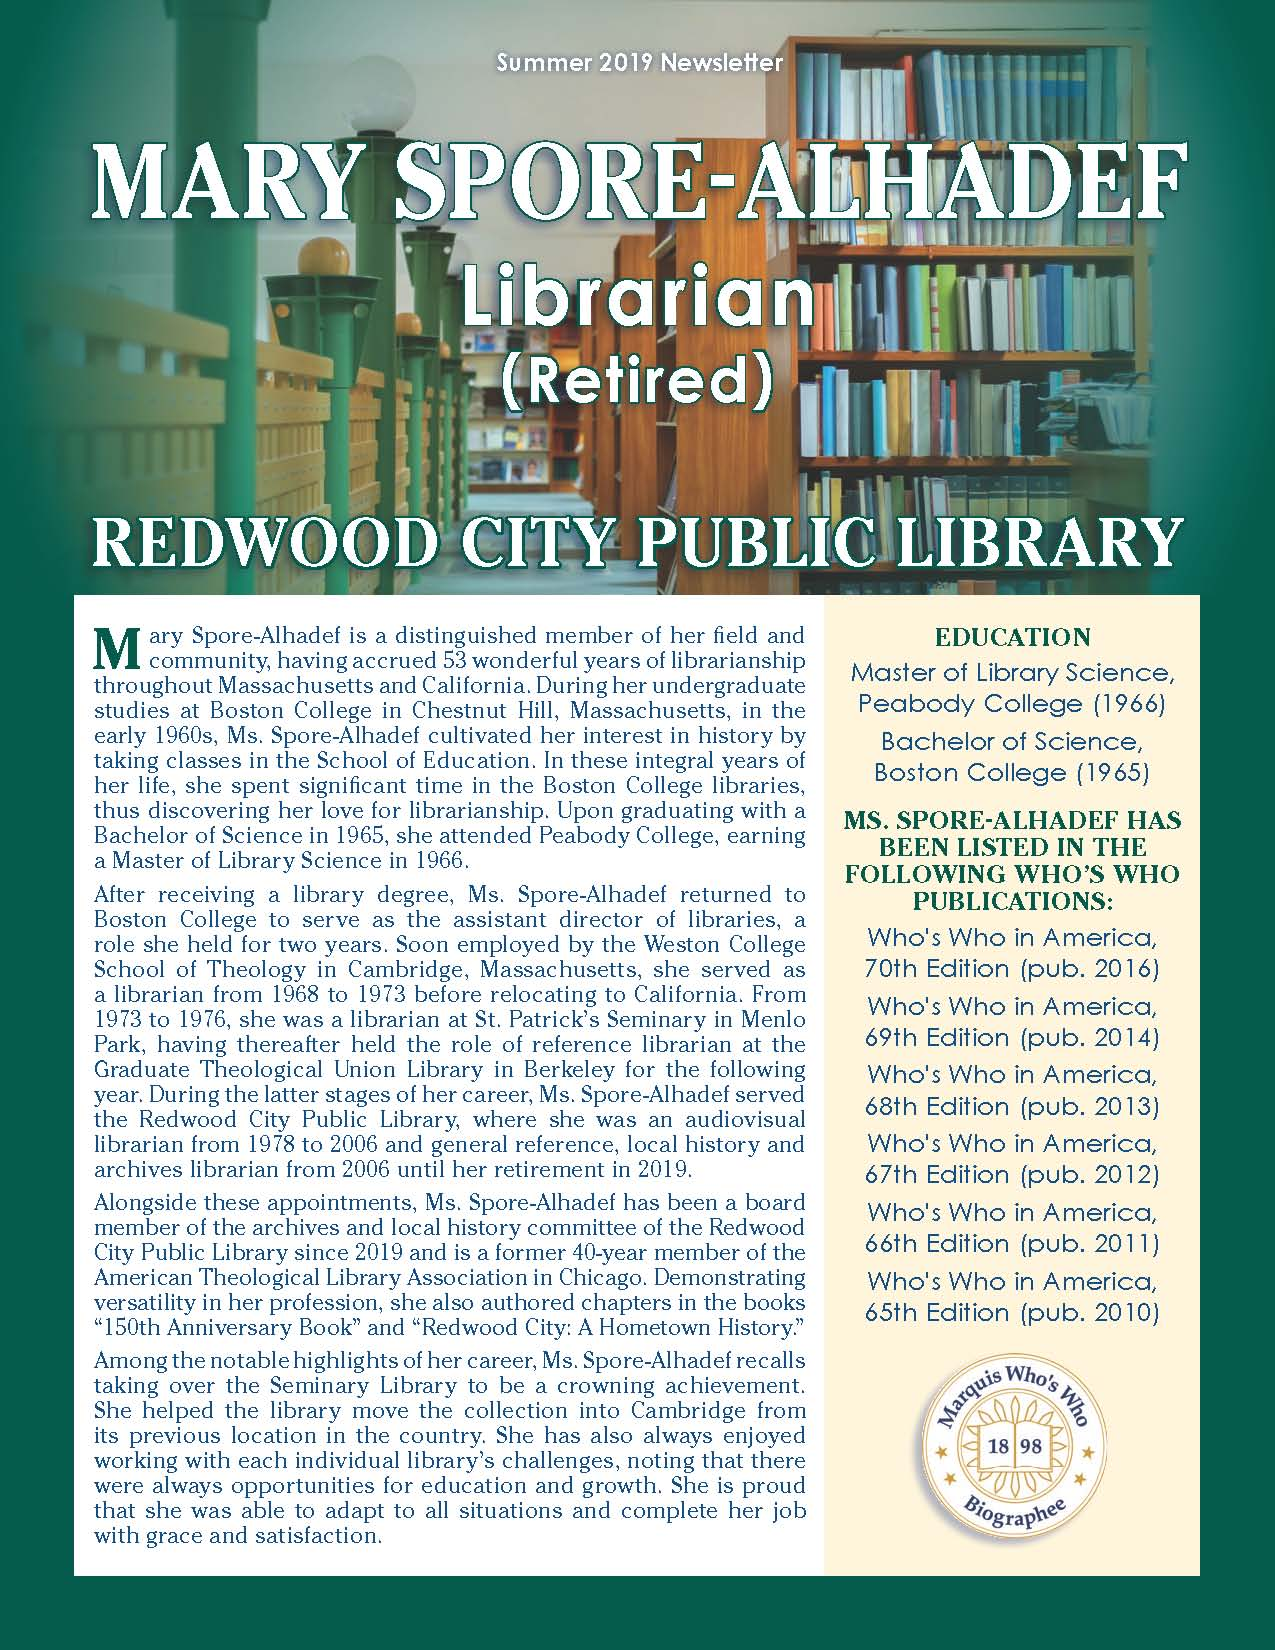 Spore-Alhadef, Mary 3632422_35093289 Newsletter